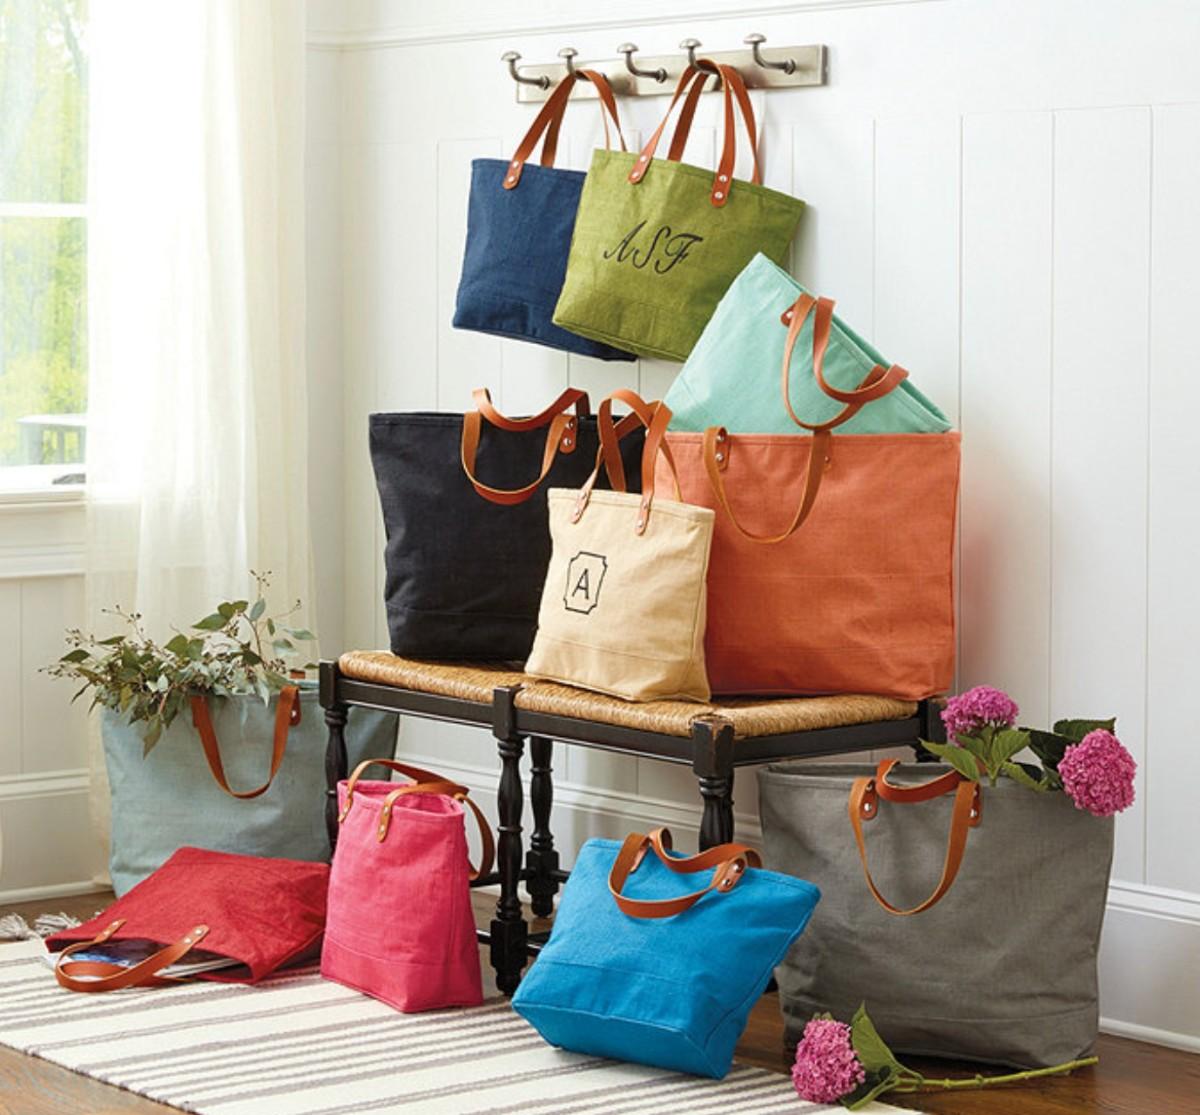 monogram-jute-tote-bags.jpg